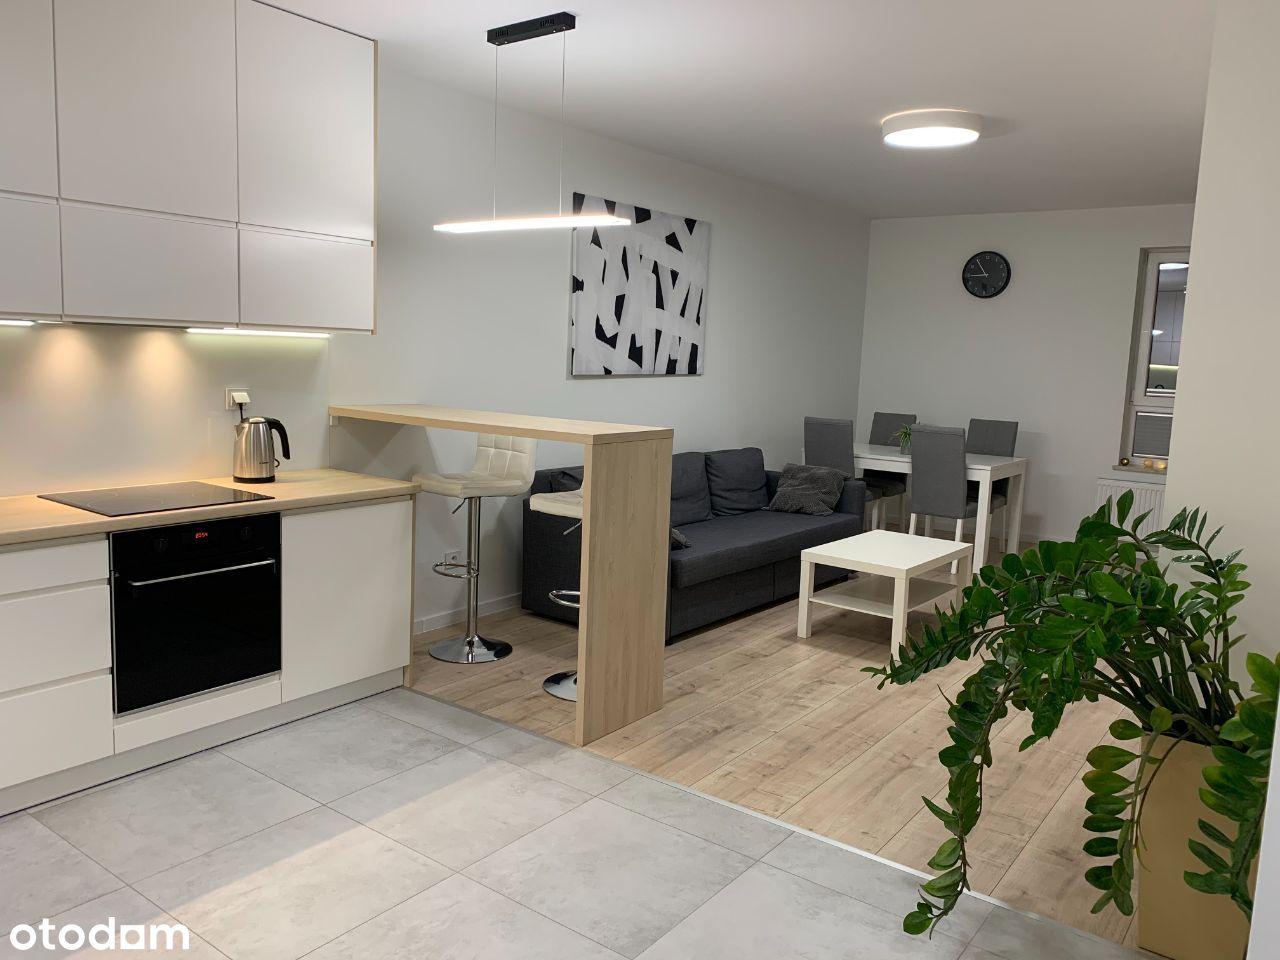 Apartament 2-pokojowy Matejki 11